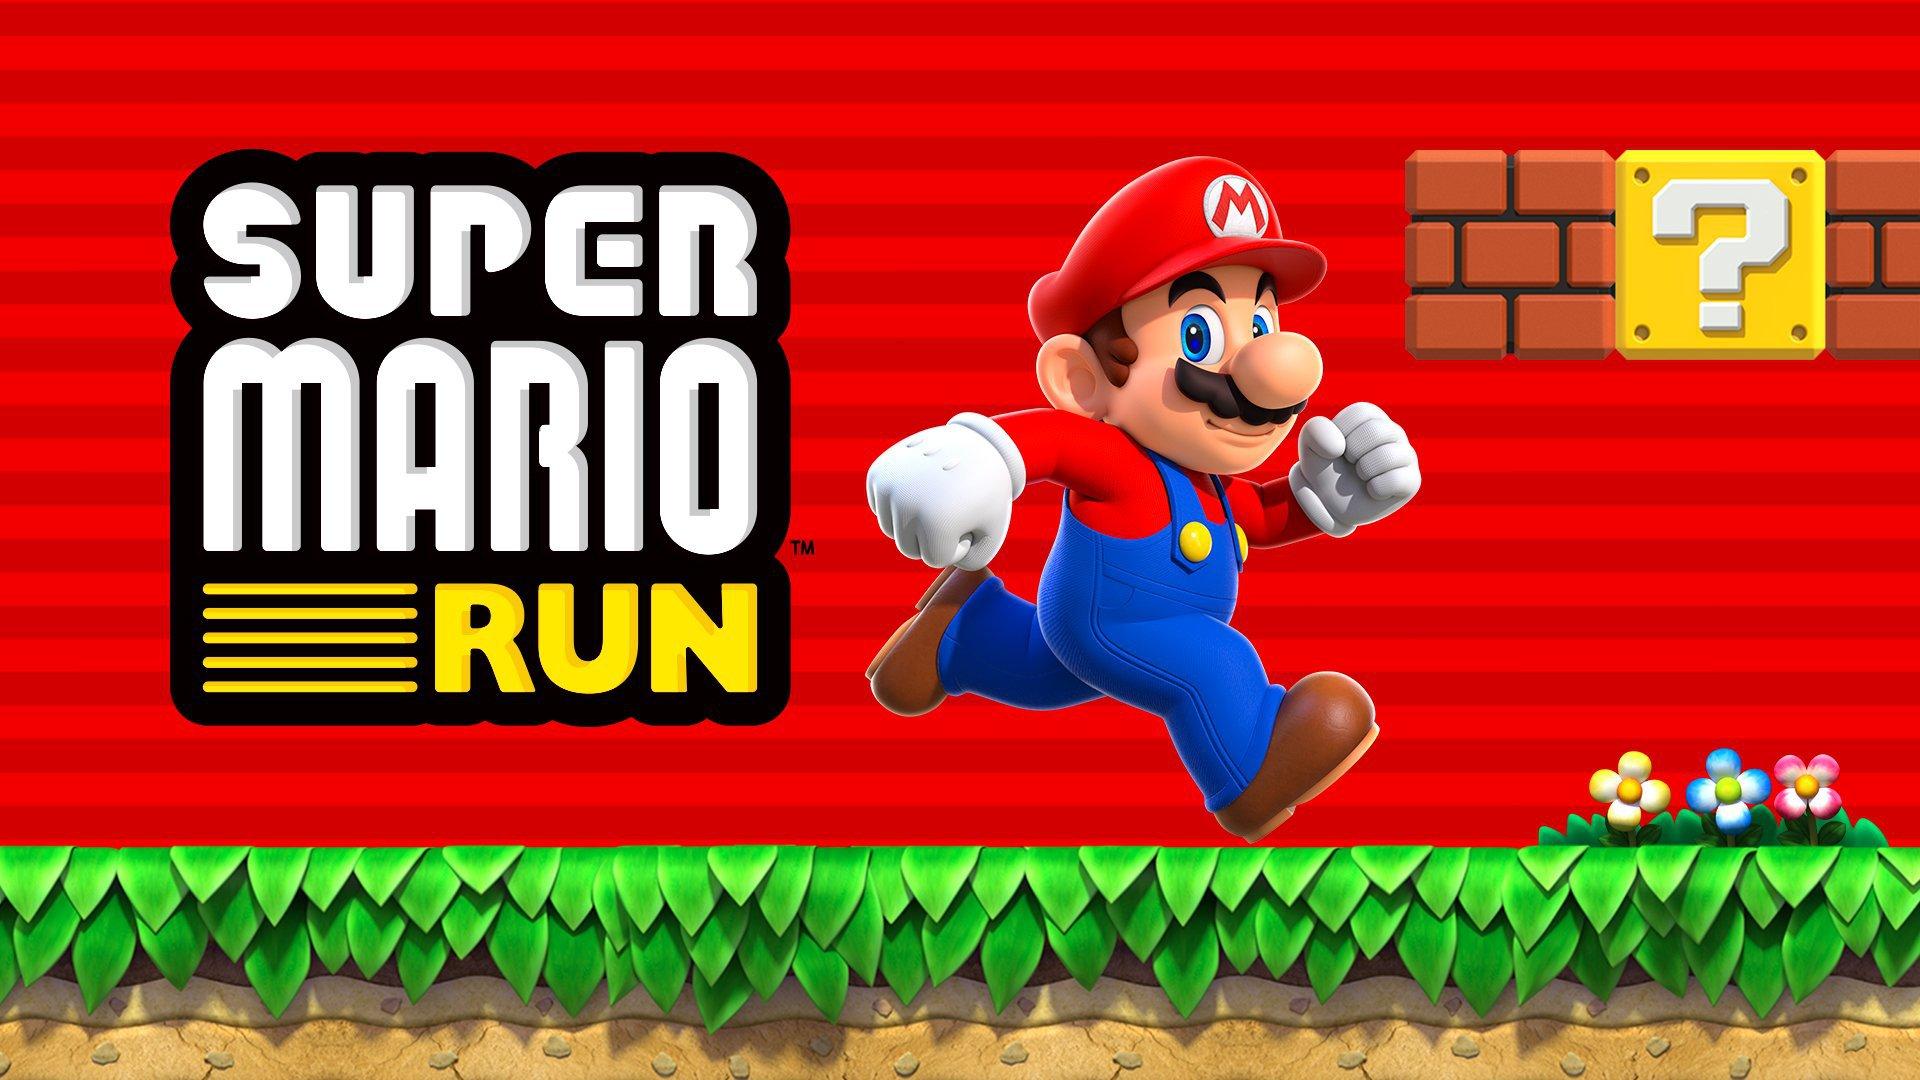 Super Mario Run با ۱۵۰ میلیون دانلود، از Fire Emblem کمتر درآمد زا بوده است